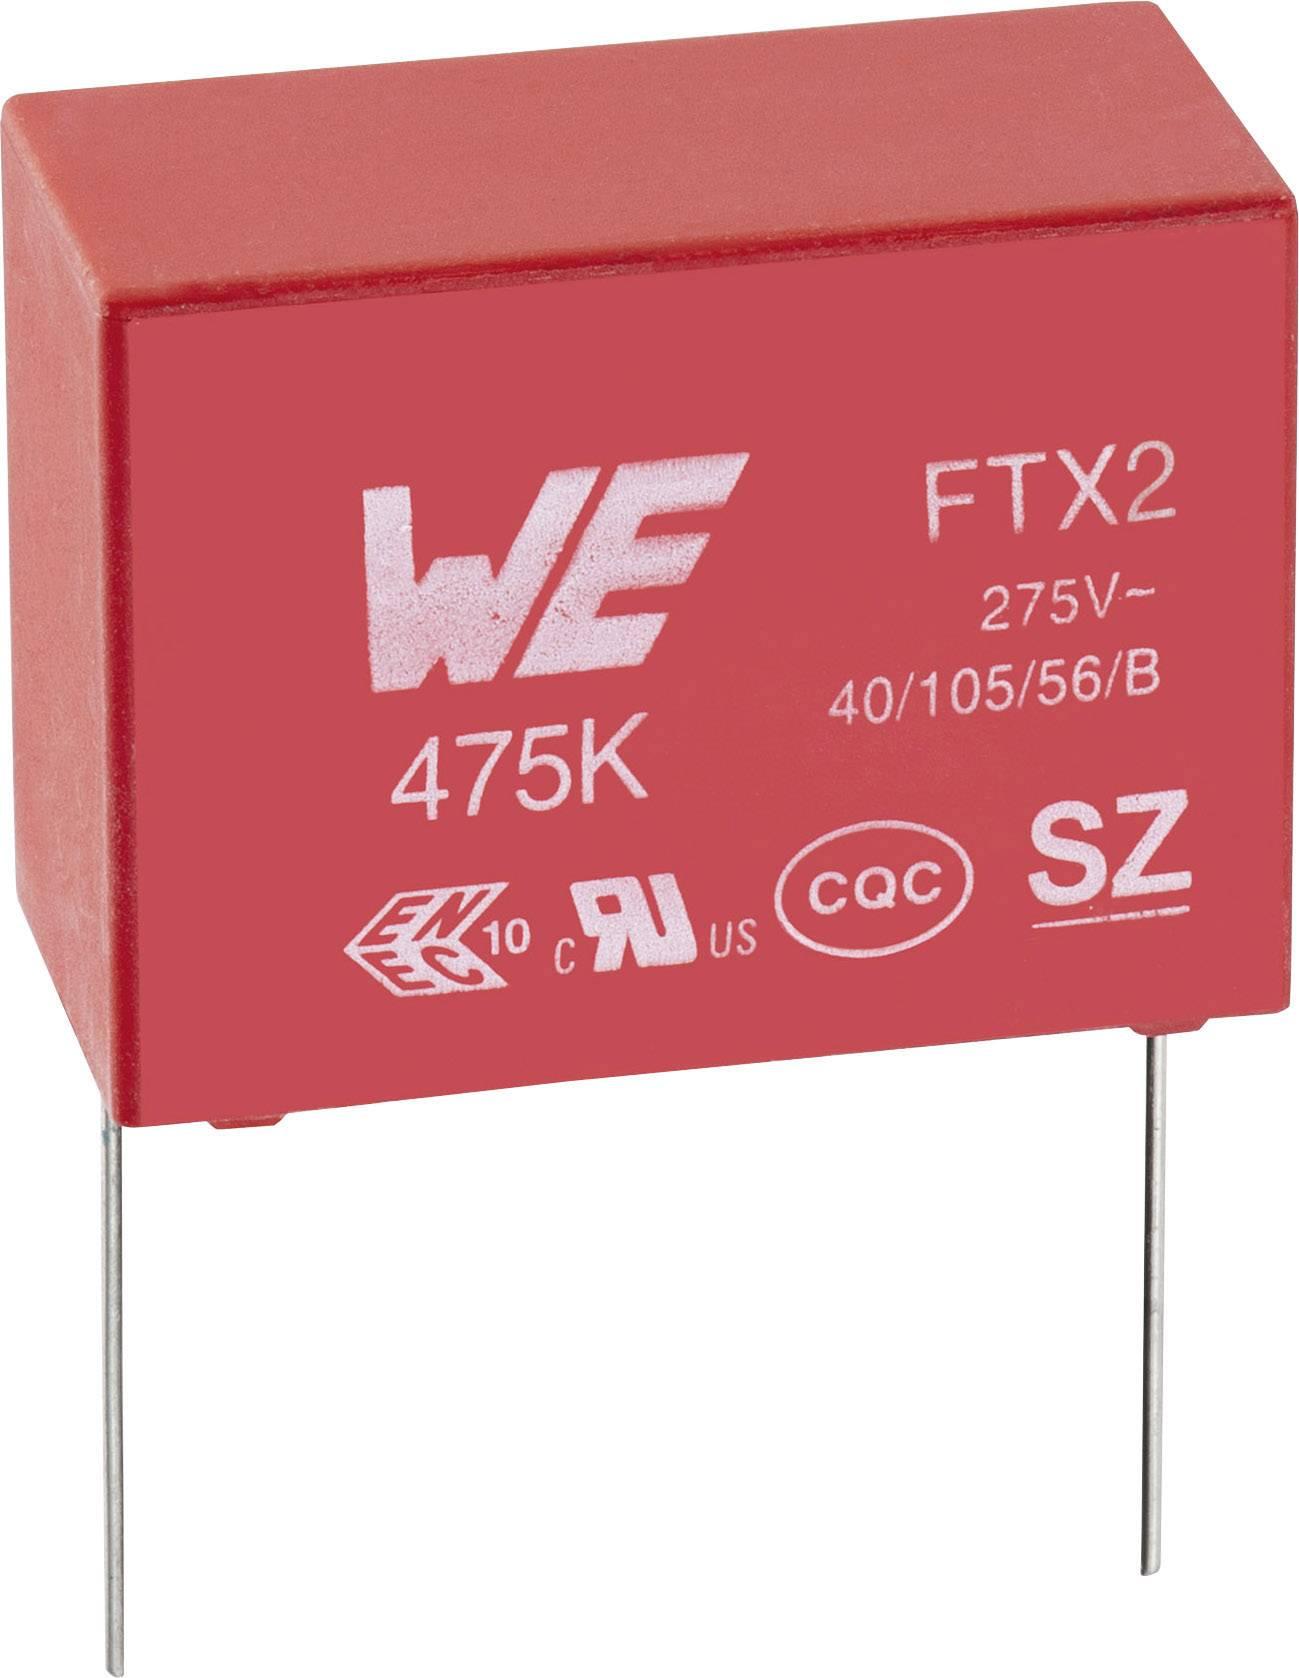 Fóliový kondenzátor Würth WCAP-FTX2, 890324023007CS, 12000 pF, 275 V / AC, 10%, RM 10 mm